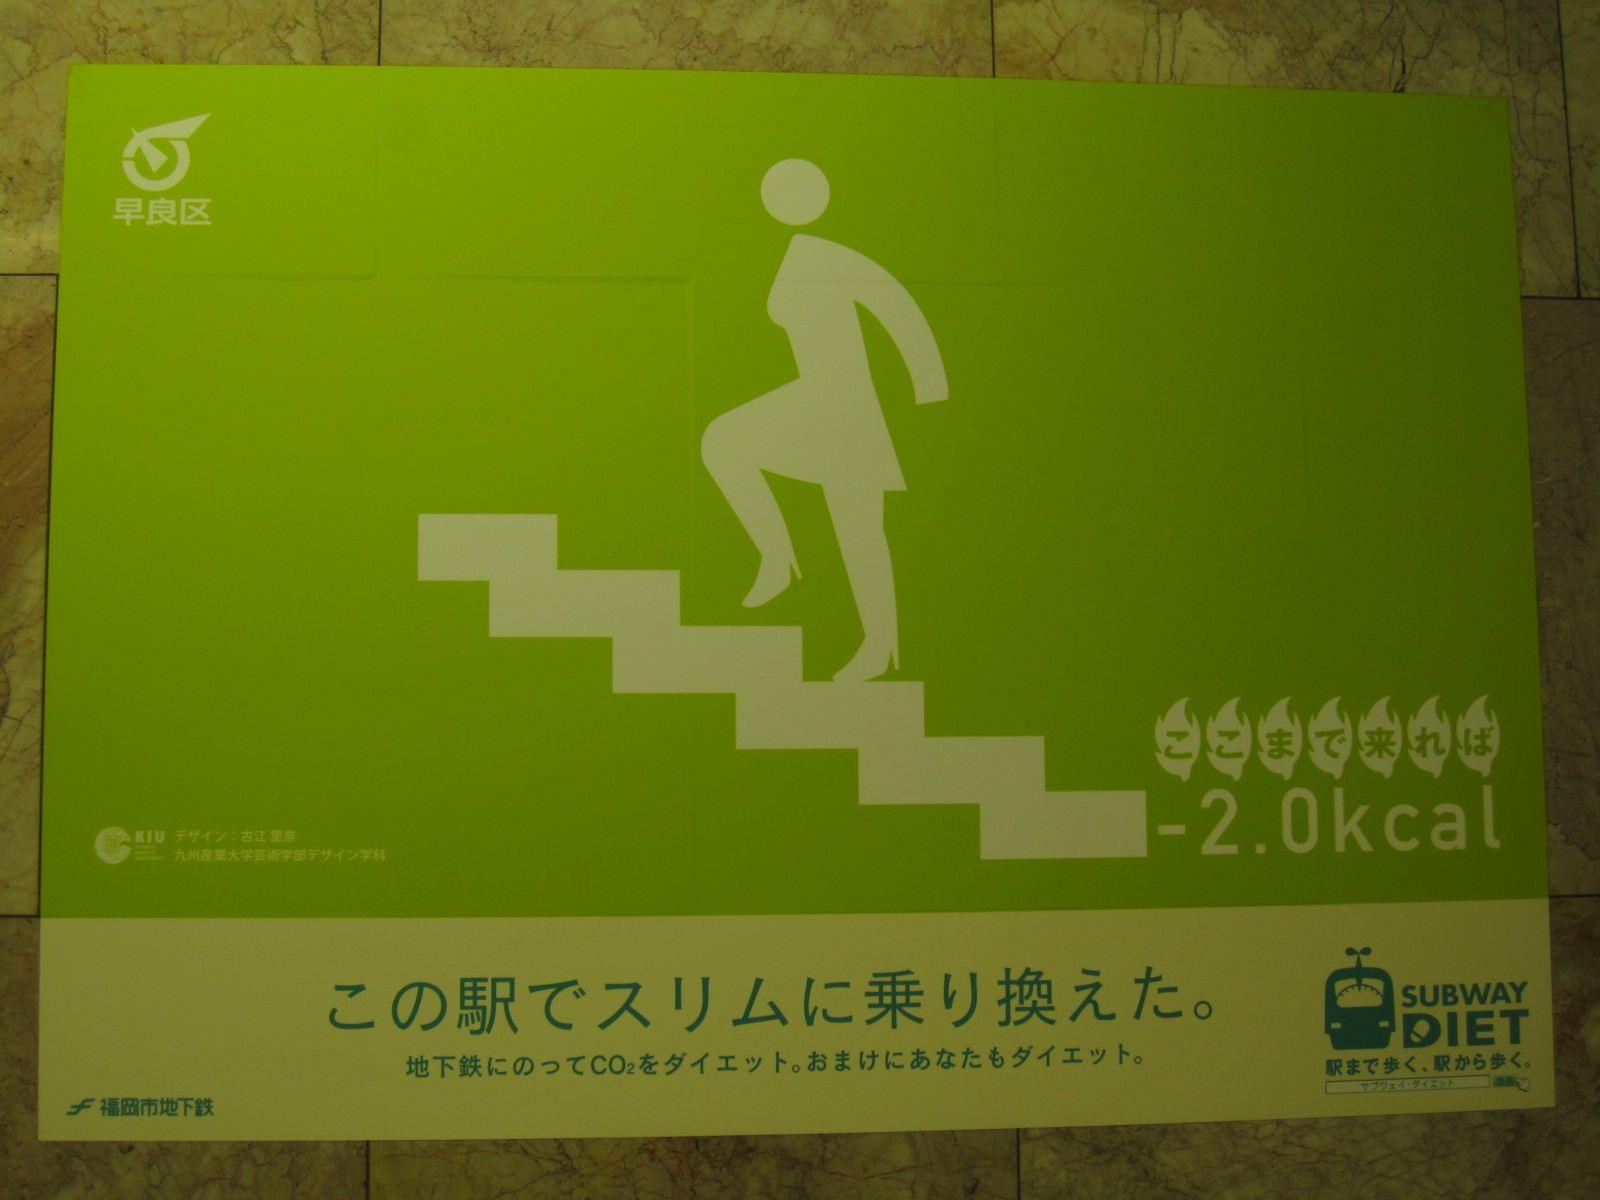 http://1.bp.blogspot.com/-3Ev6Yqay64U/T9xSvq1YxwI/AAAAAAAAAiY/zB32QwAIkWU/s1600/StairCalories.jpg